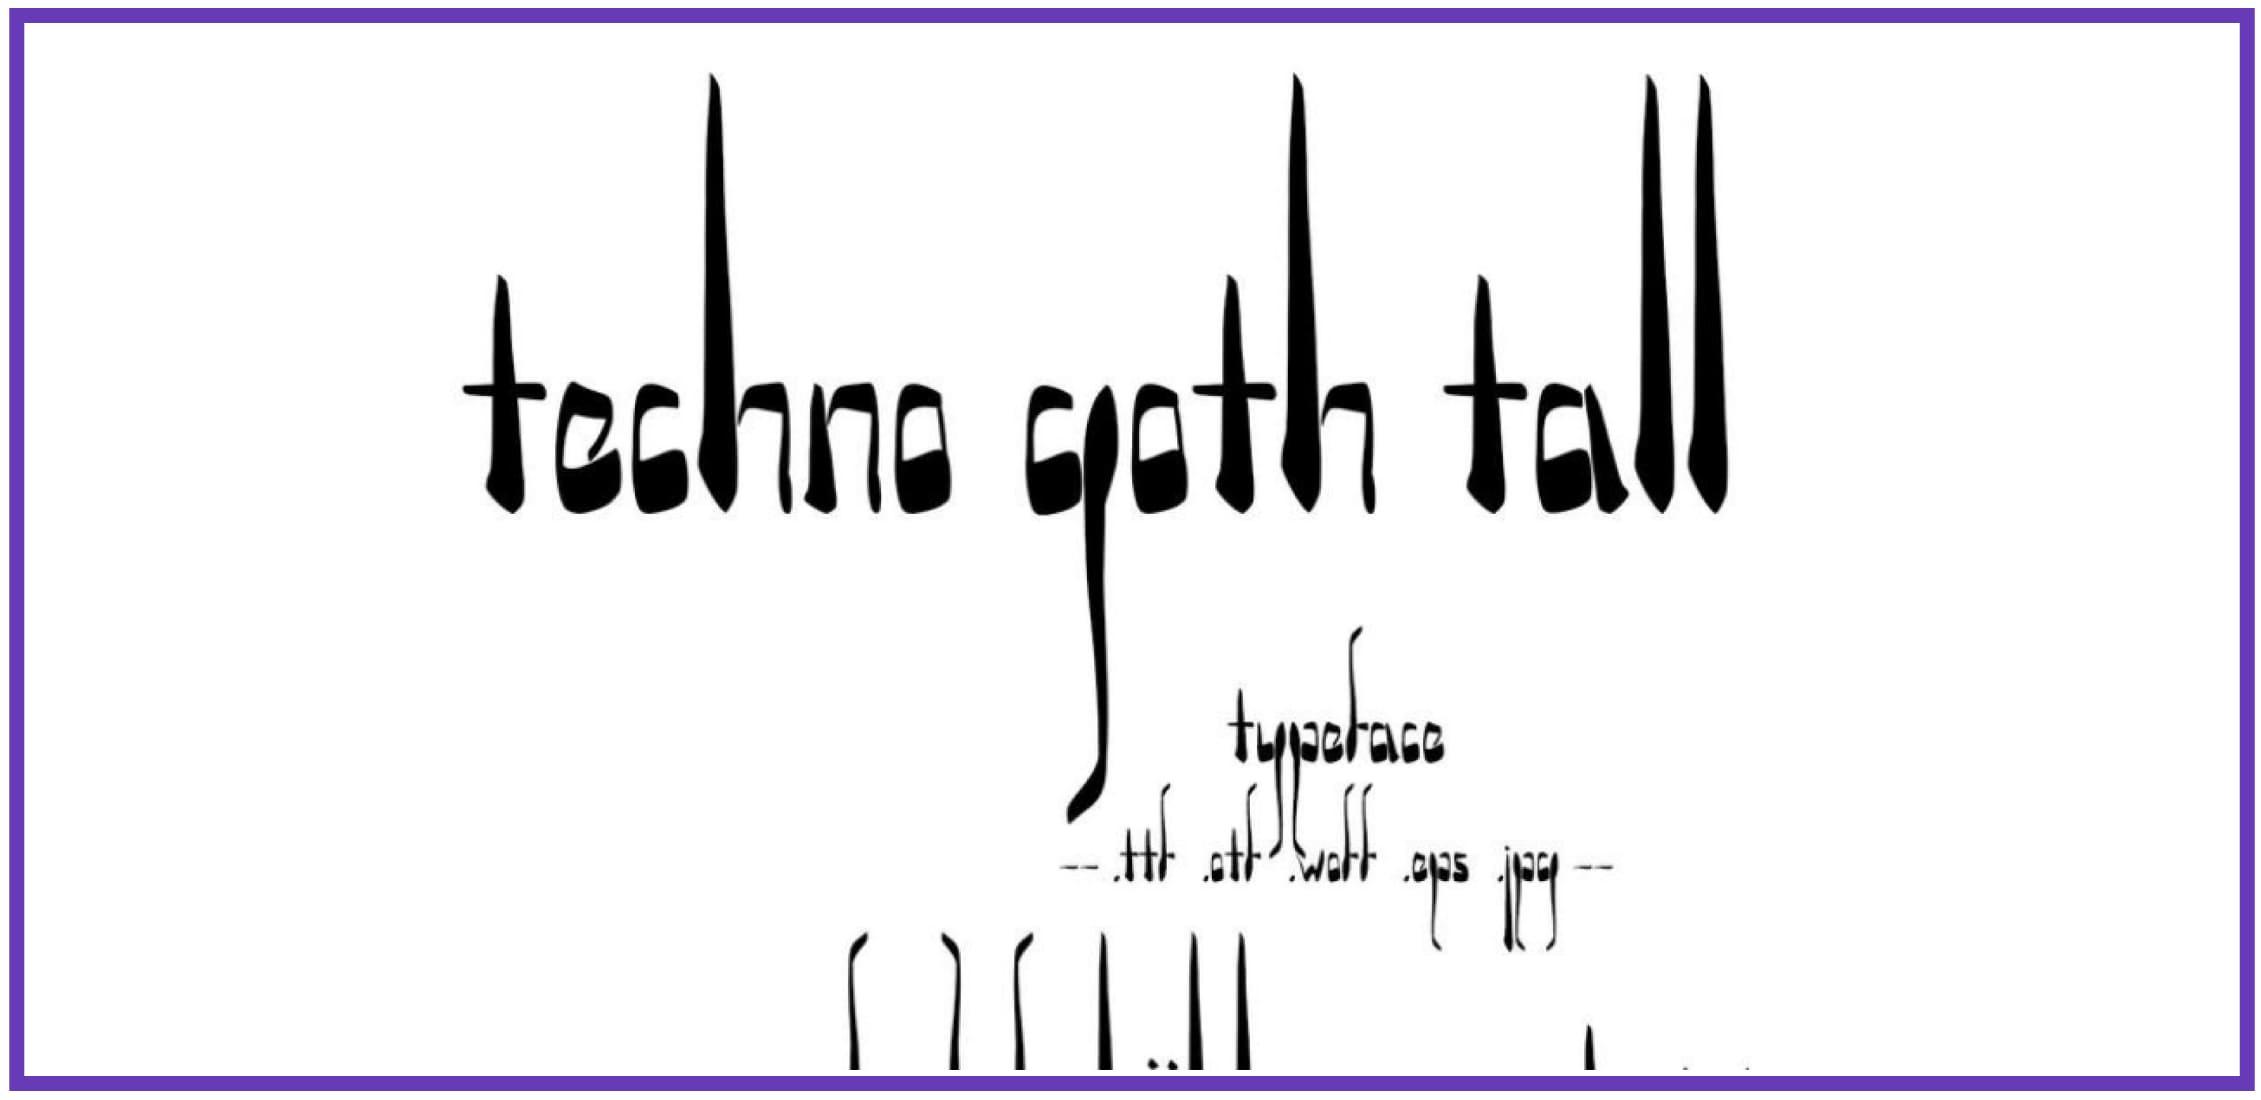 Versatile Techno Goth Tall. Punk Font.